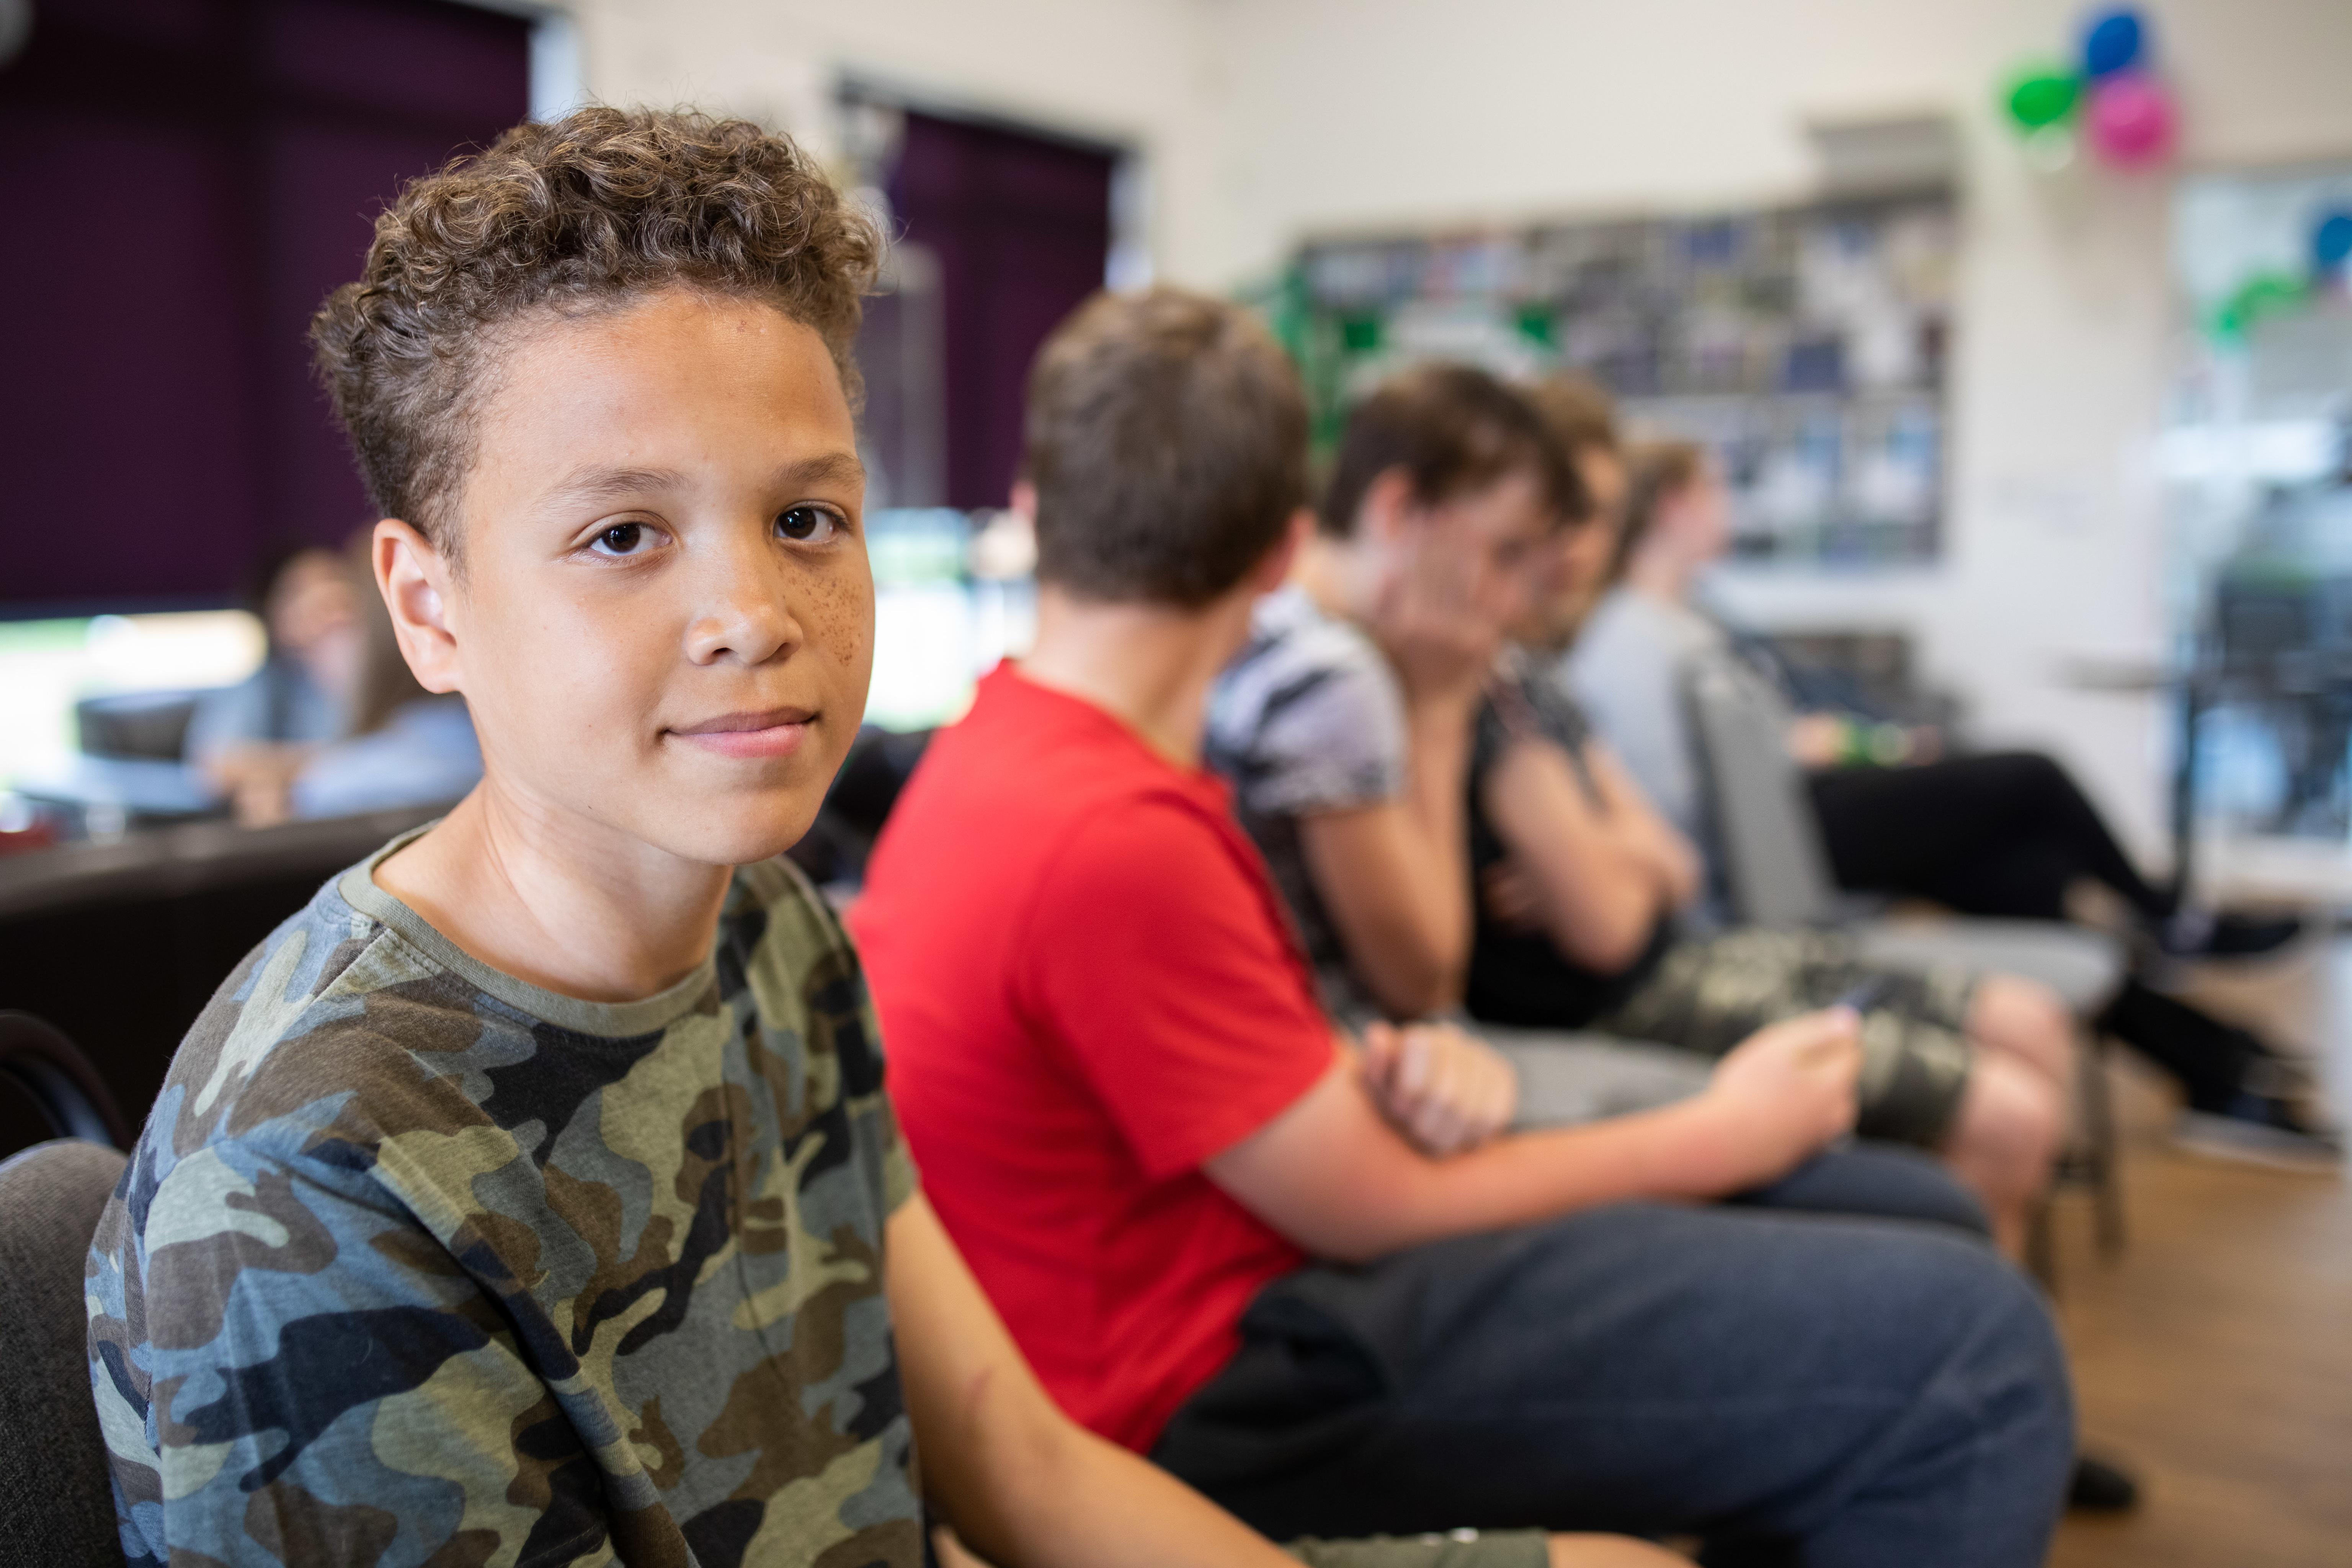 Teenage boy sitting amongst friends